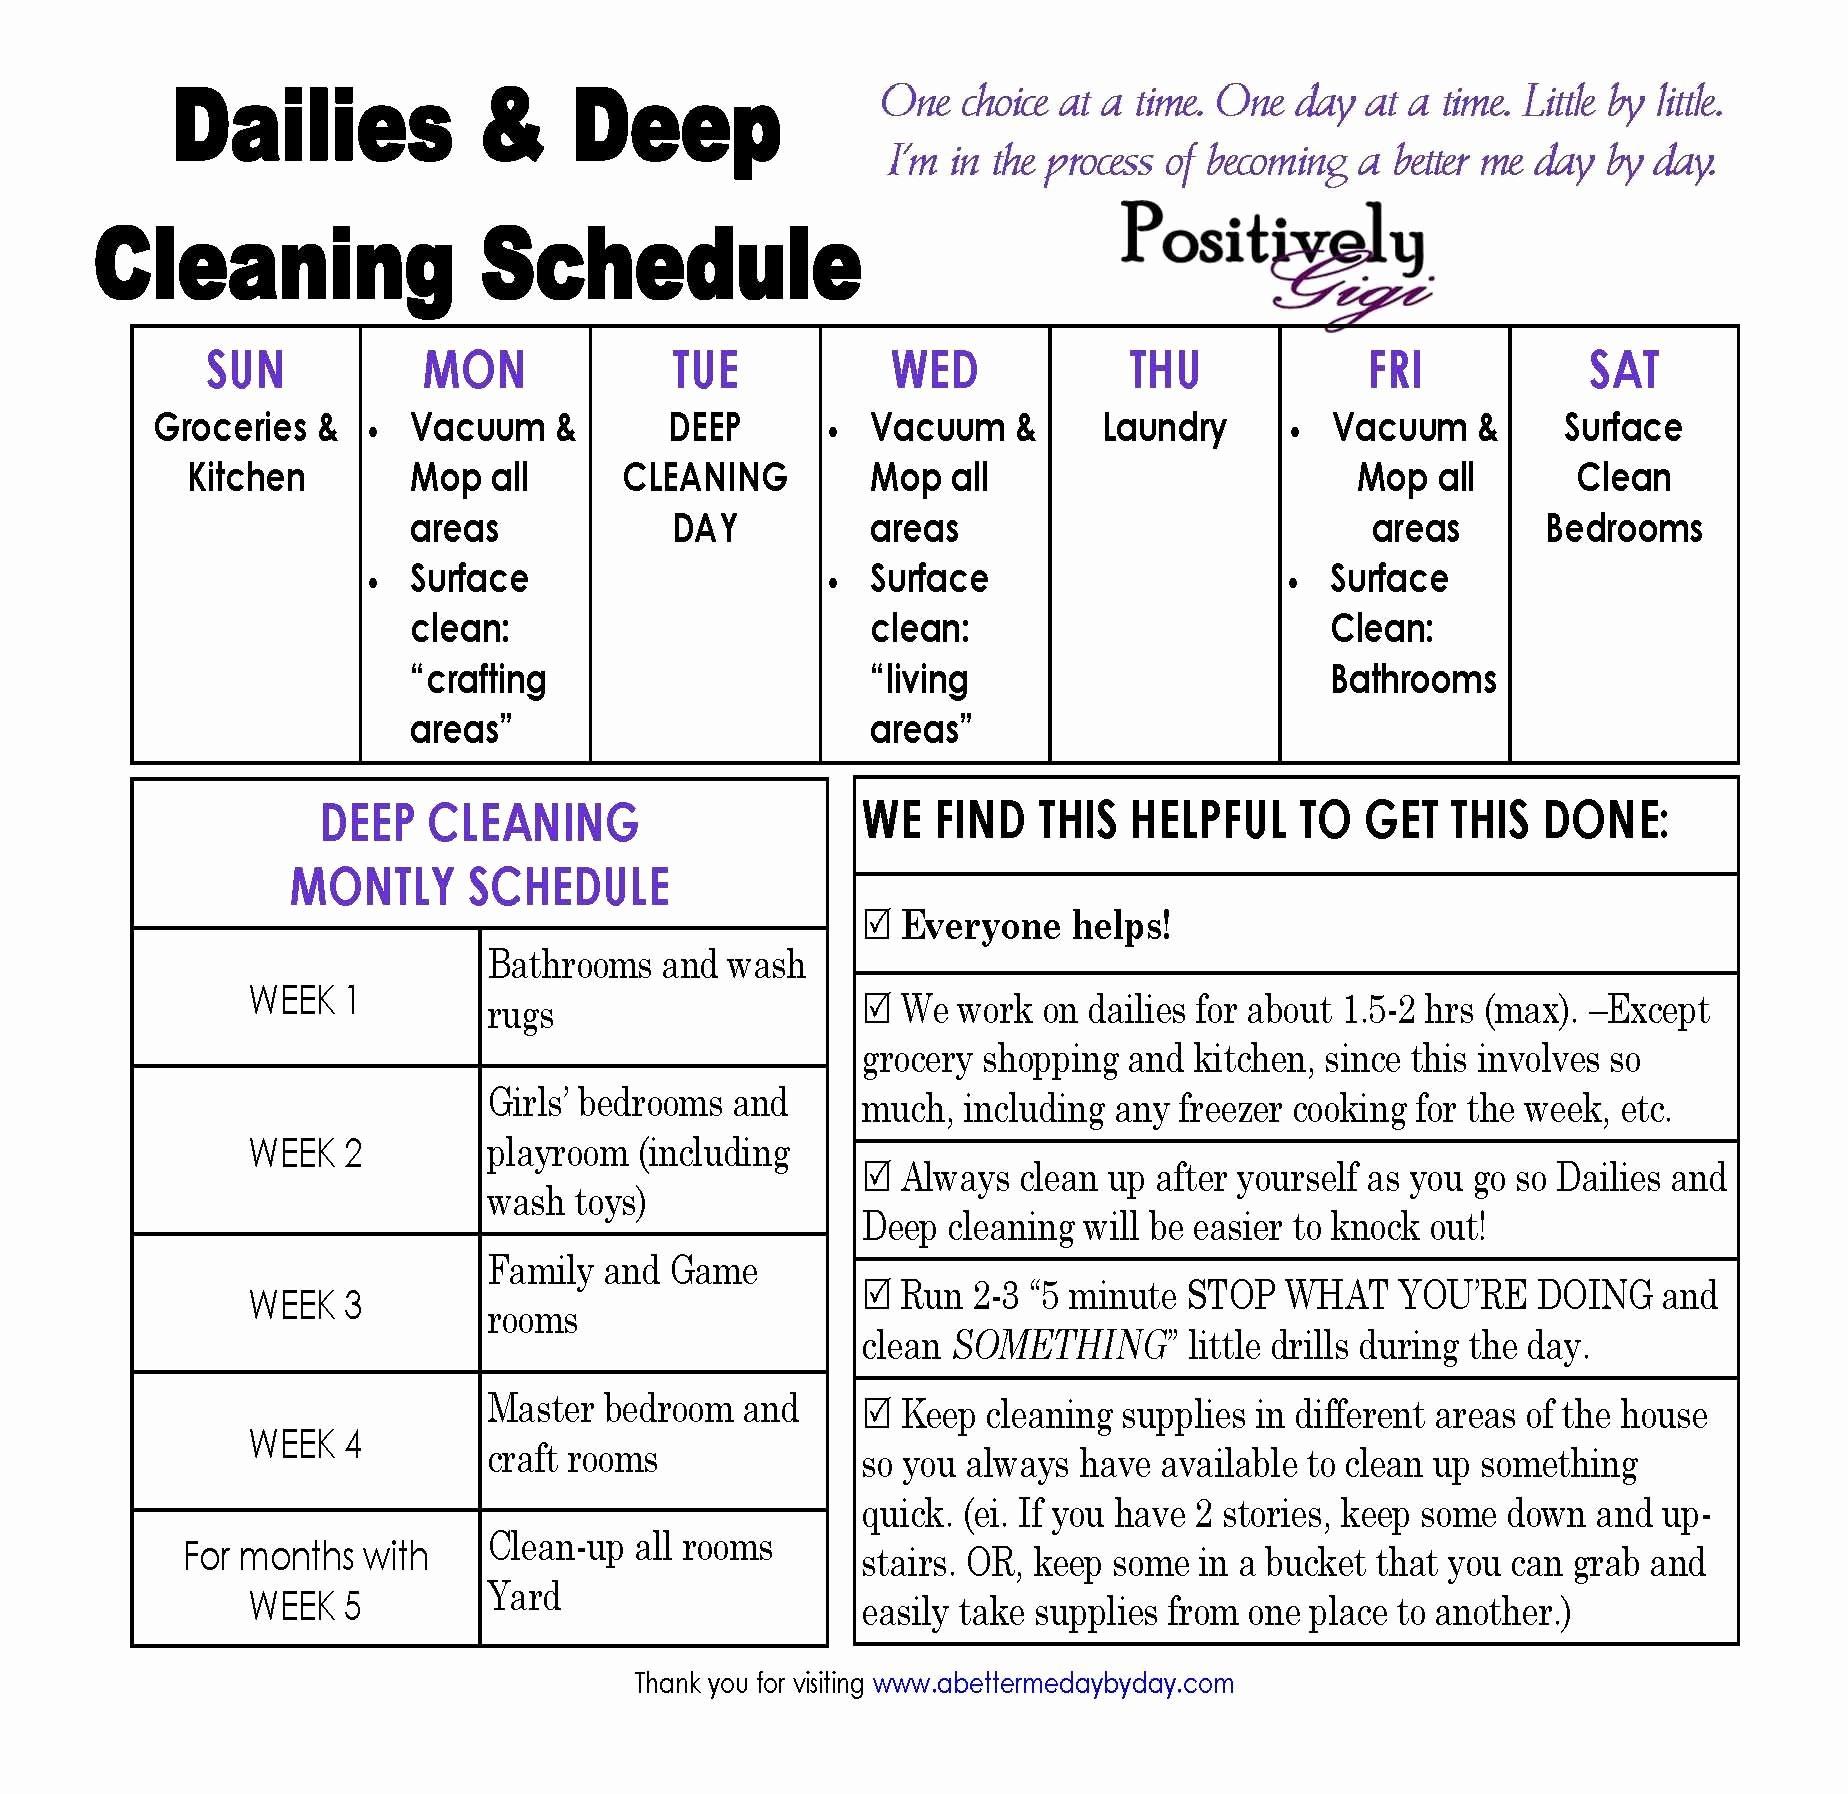 Preschool Cleaning Checklist Template New Housework Schedule Google Search